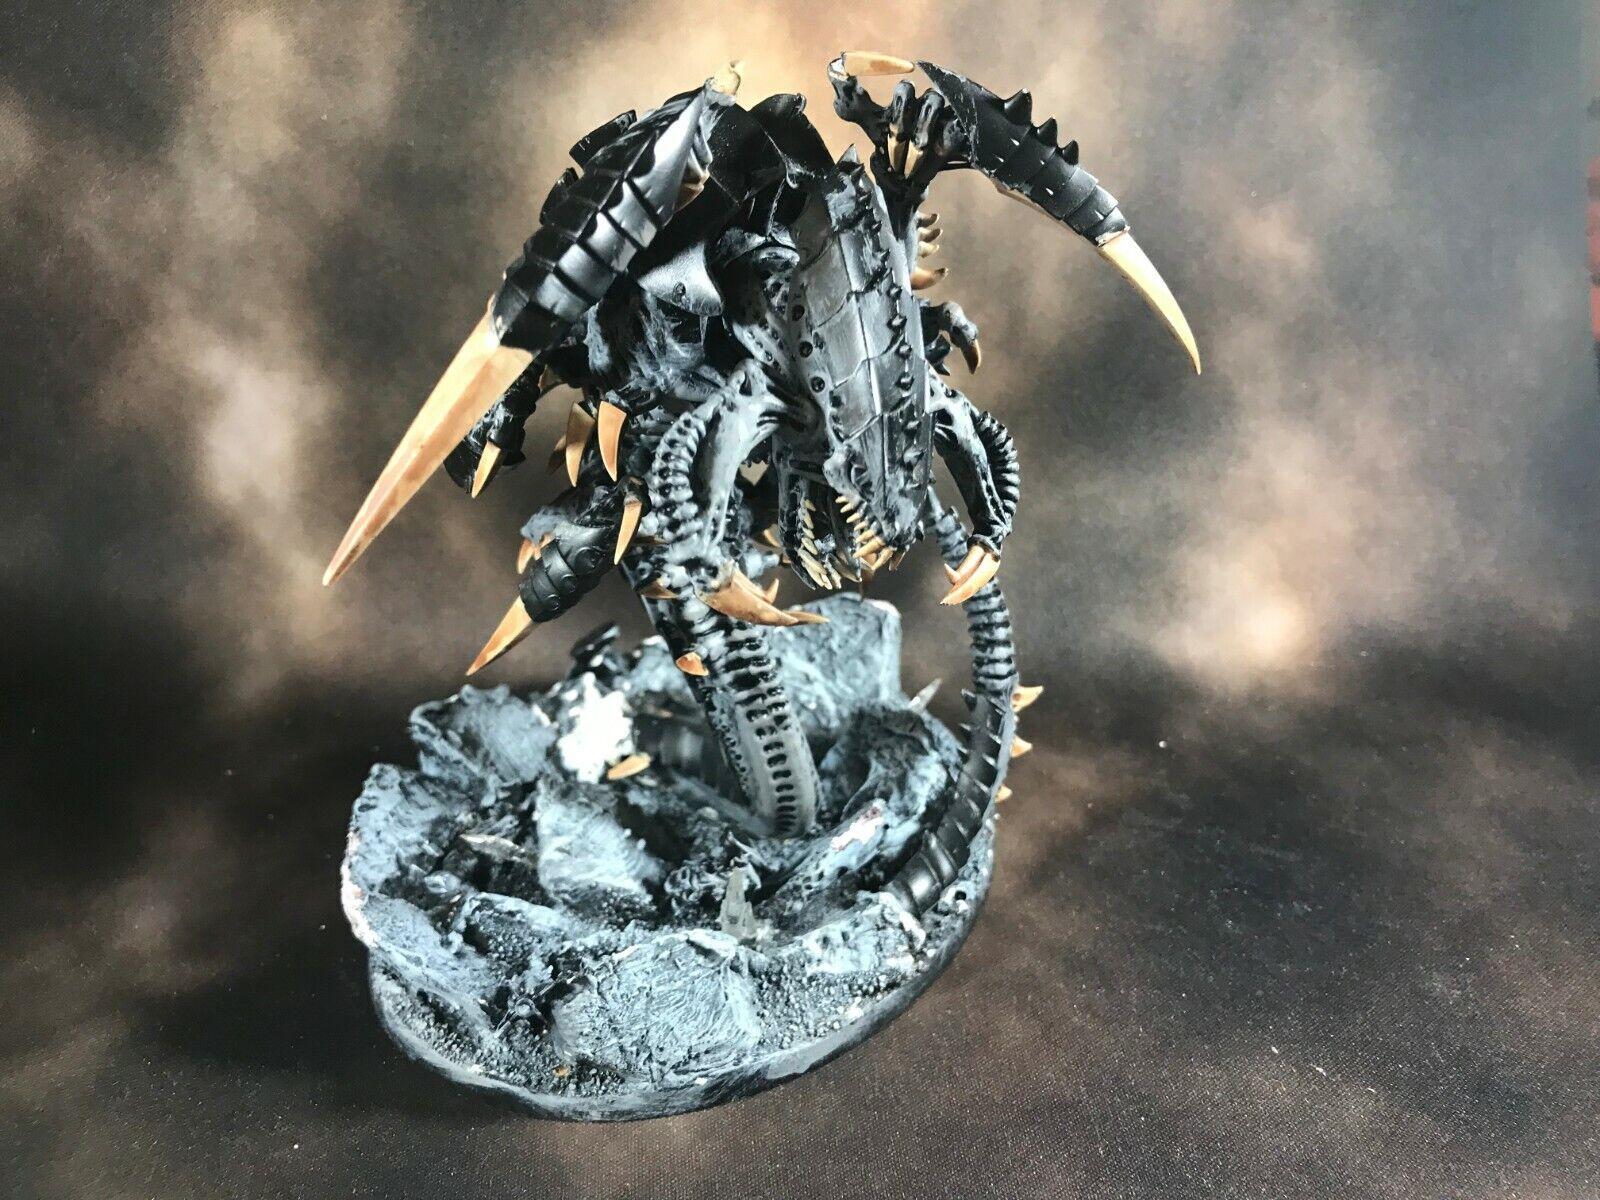 Warhammer  40k Tyranide GENESTEALER Cult voiturenifex peint  produit de qualité